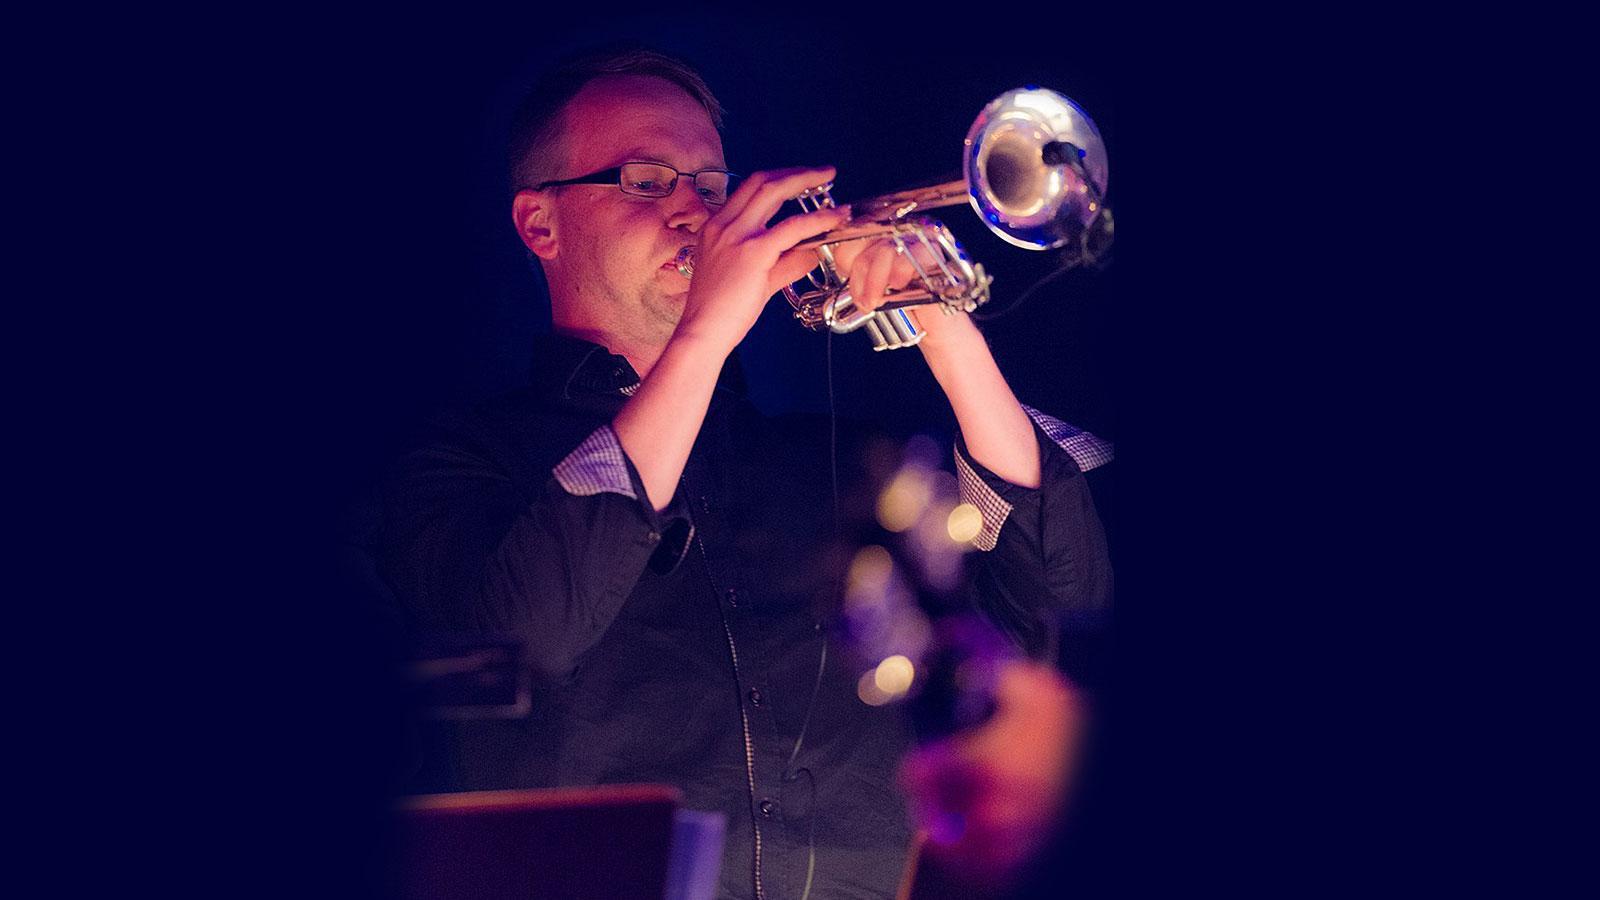 Patrik Janson Kvintett